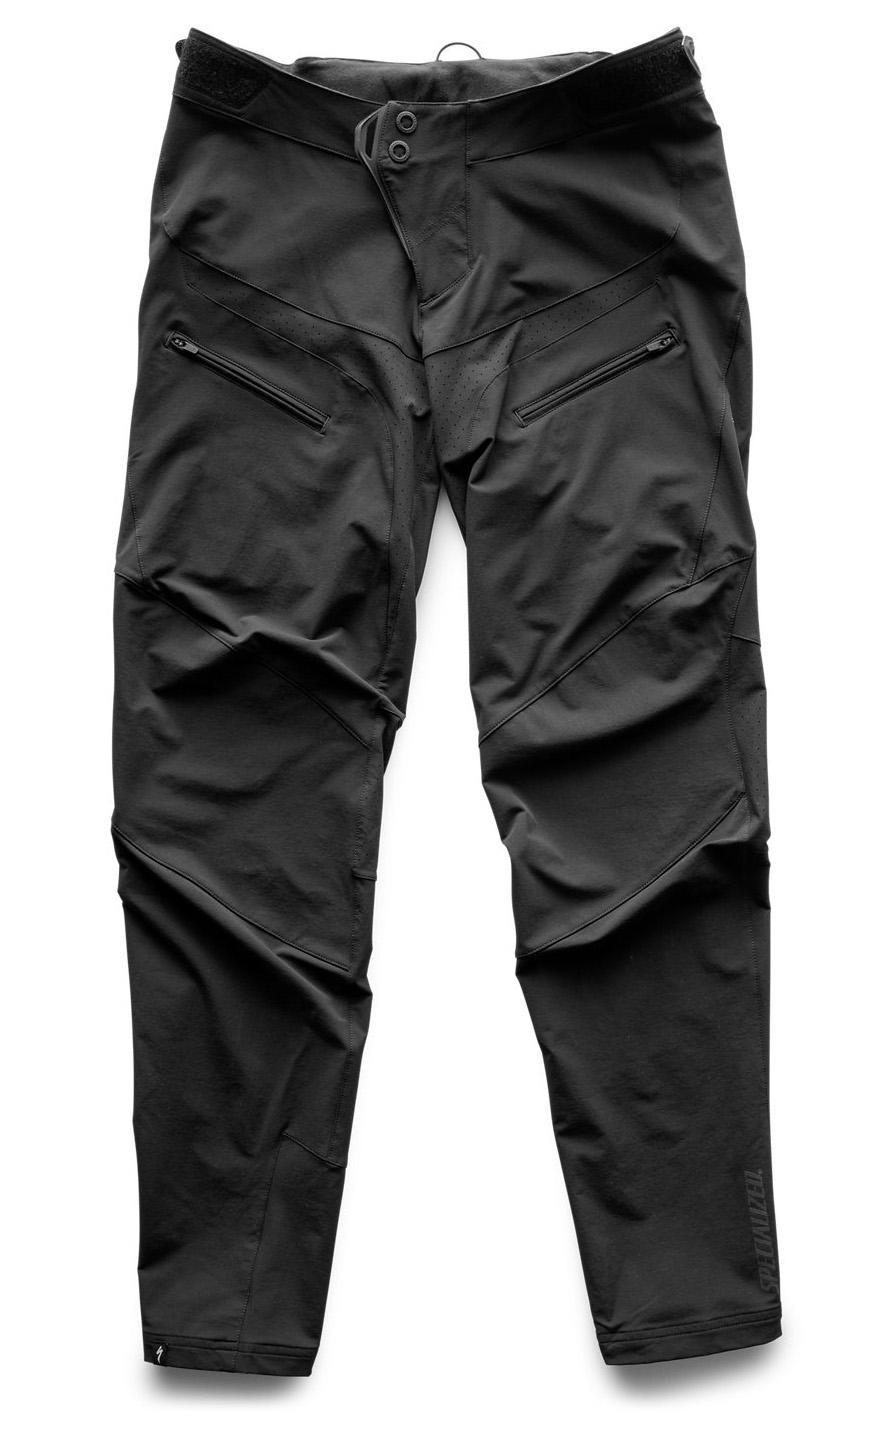 Specialized Demo Pro Pant Black - Specialized Bikes